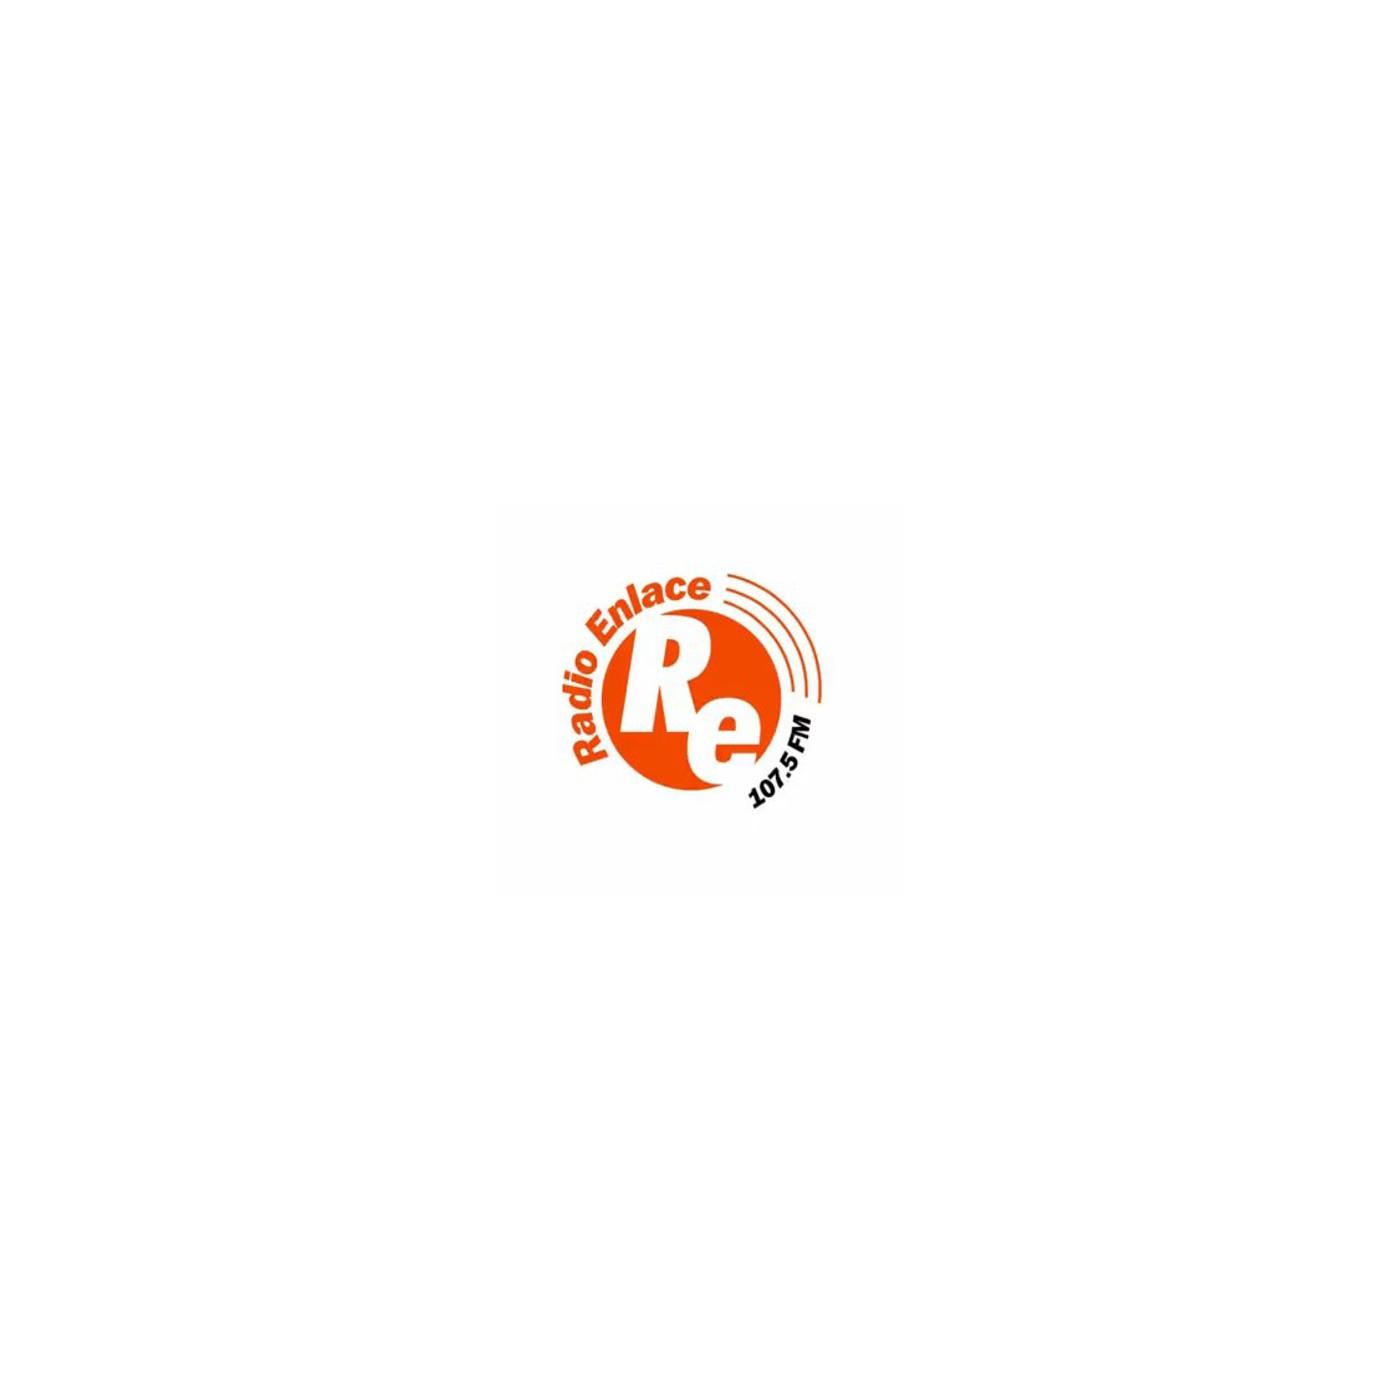 QMC 2.0-Programa 04-Radio Enlace 107,5fm-Madrid